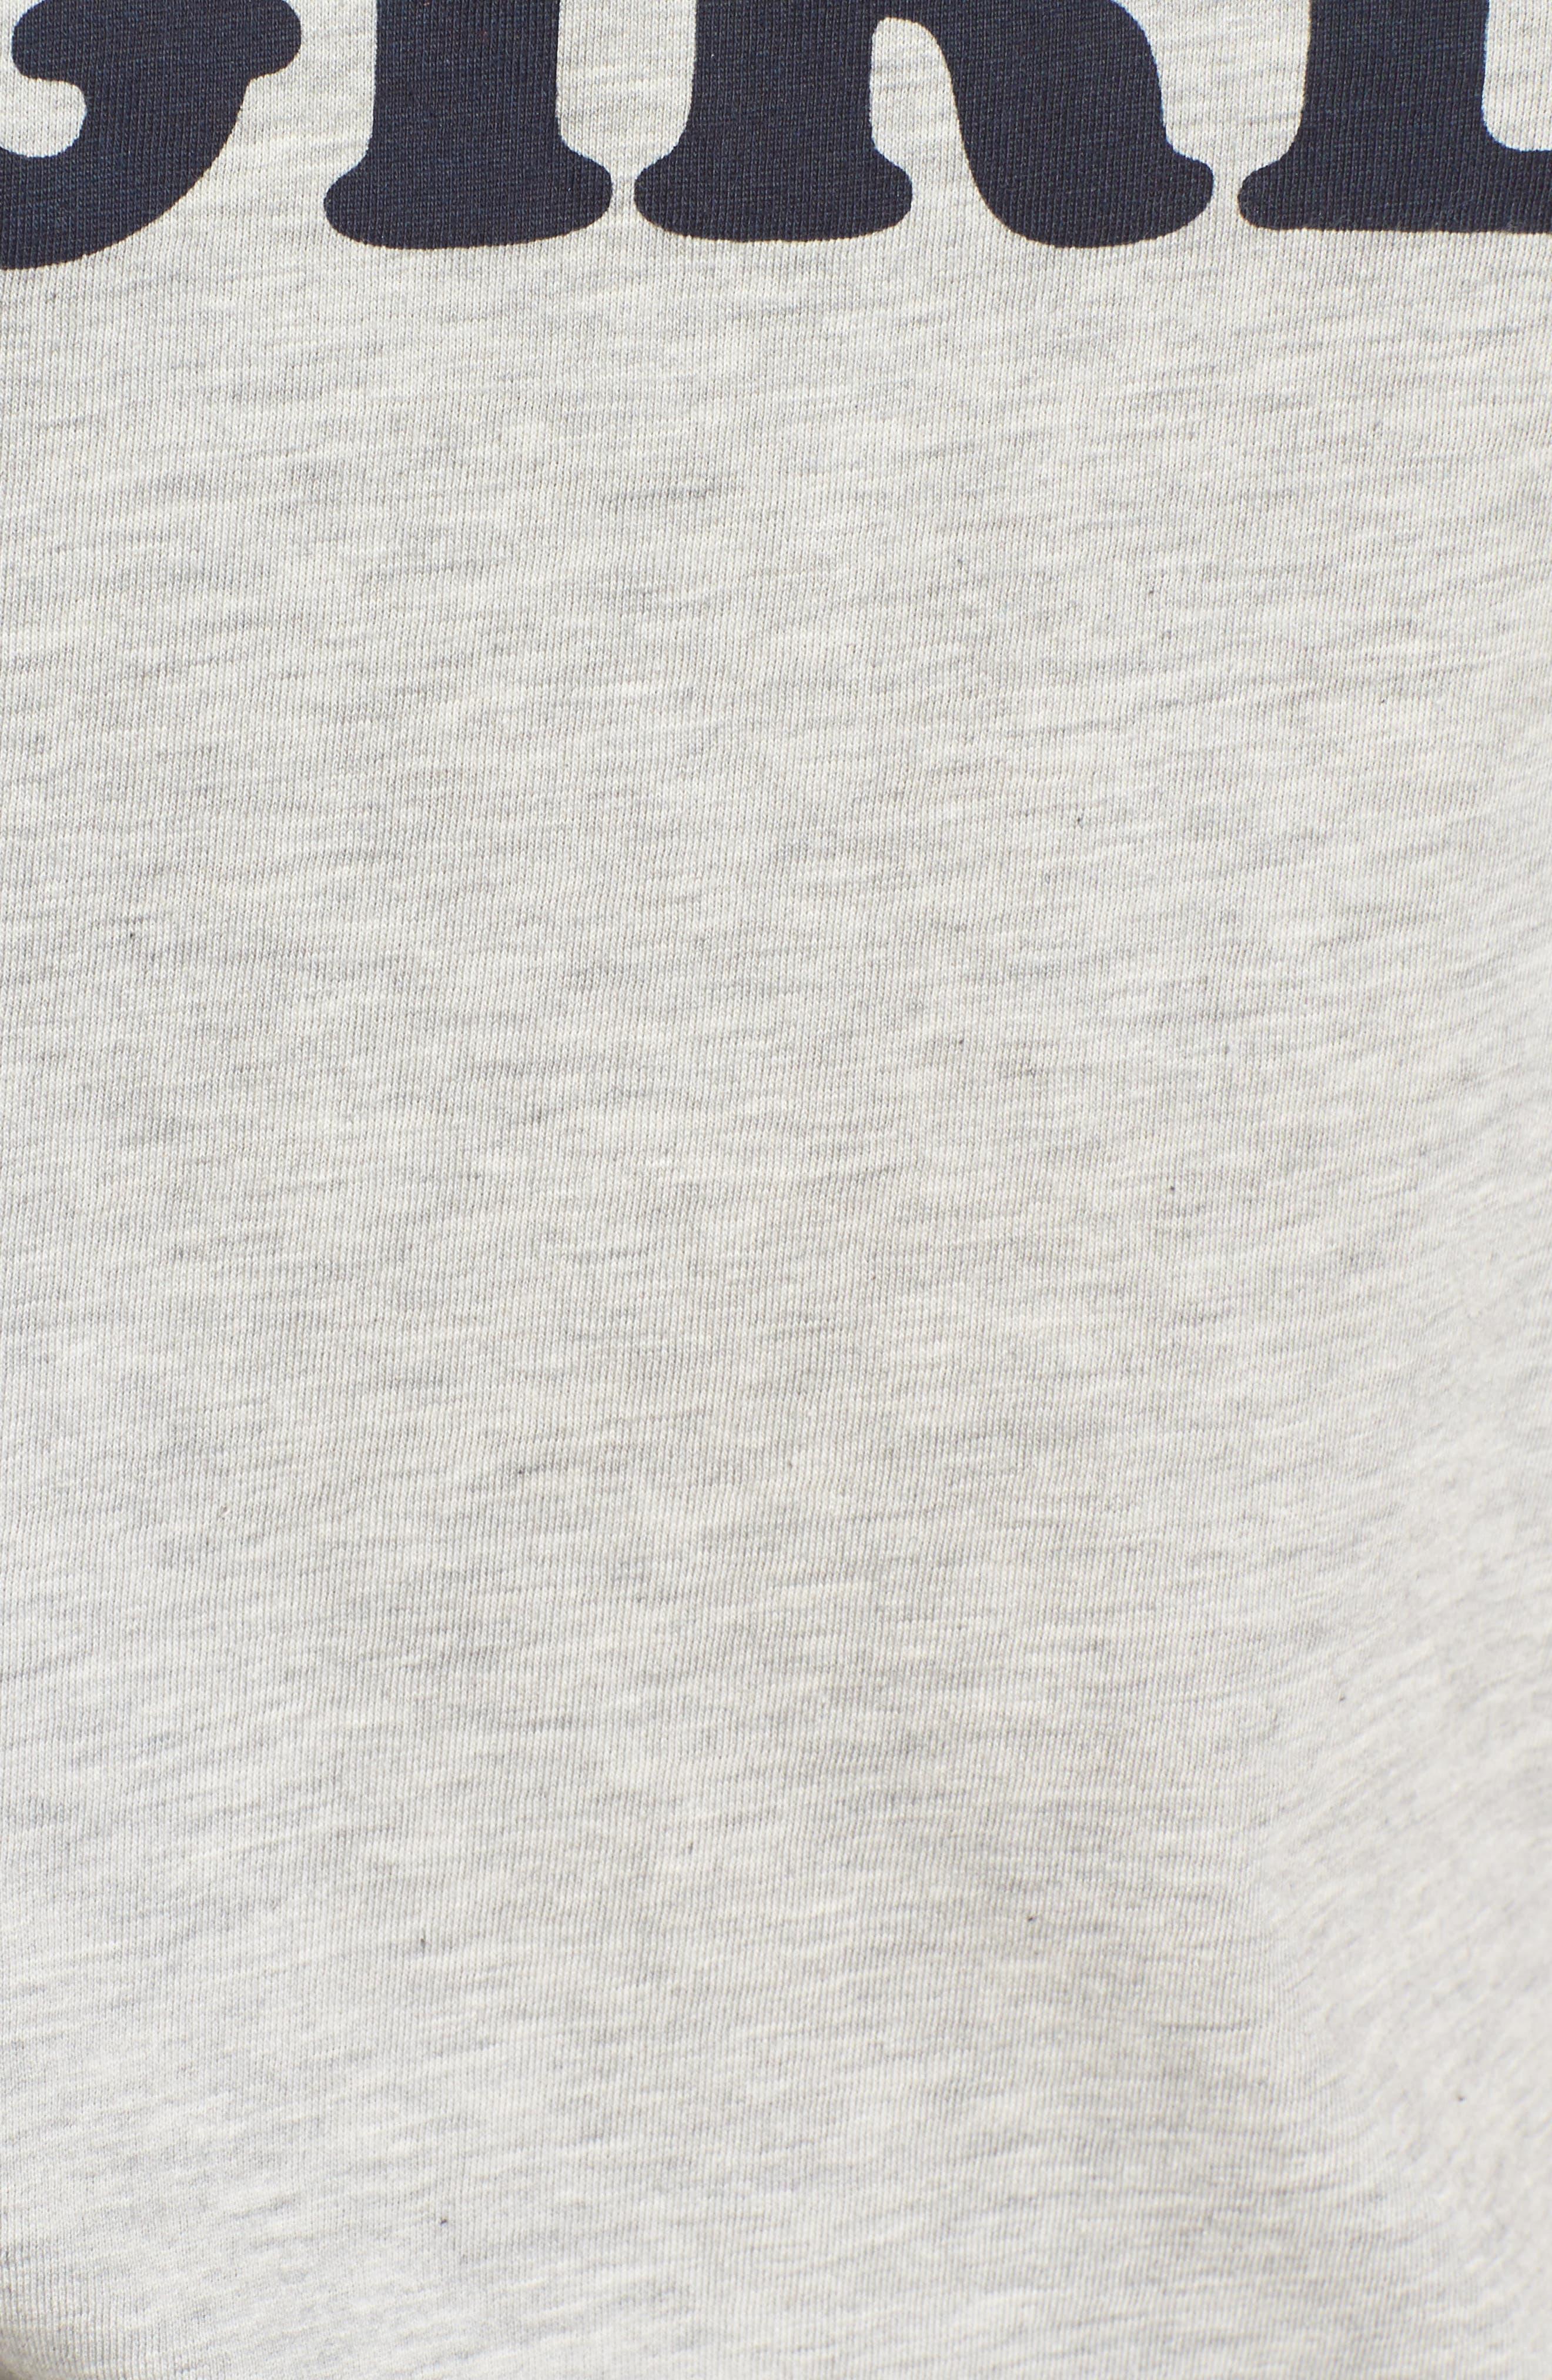 Short Sleeve Cotton Tee,                             Alternate thumbnail 52, color,